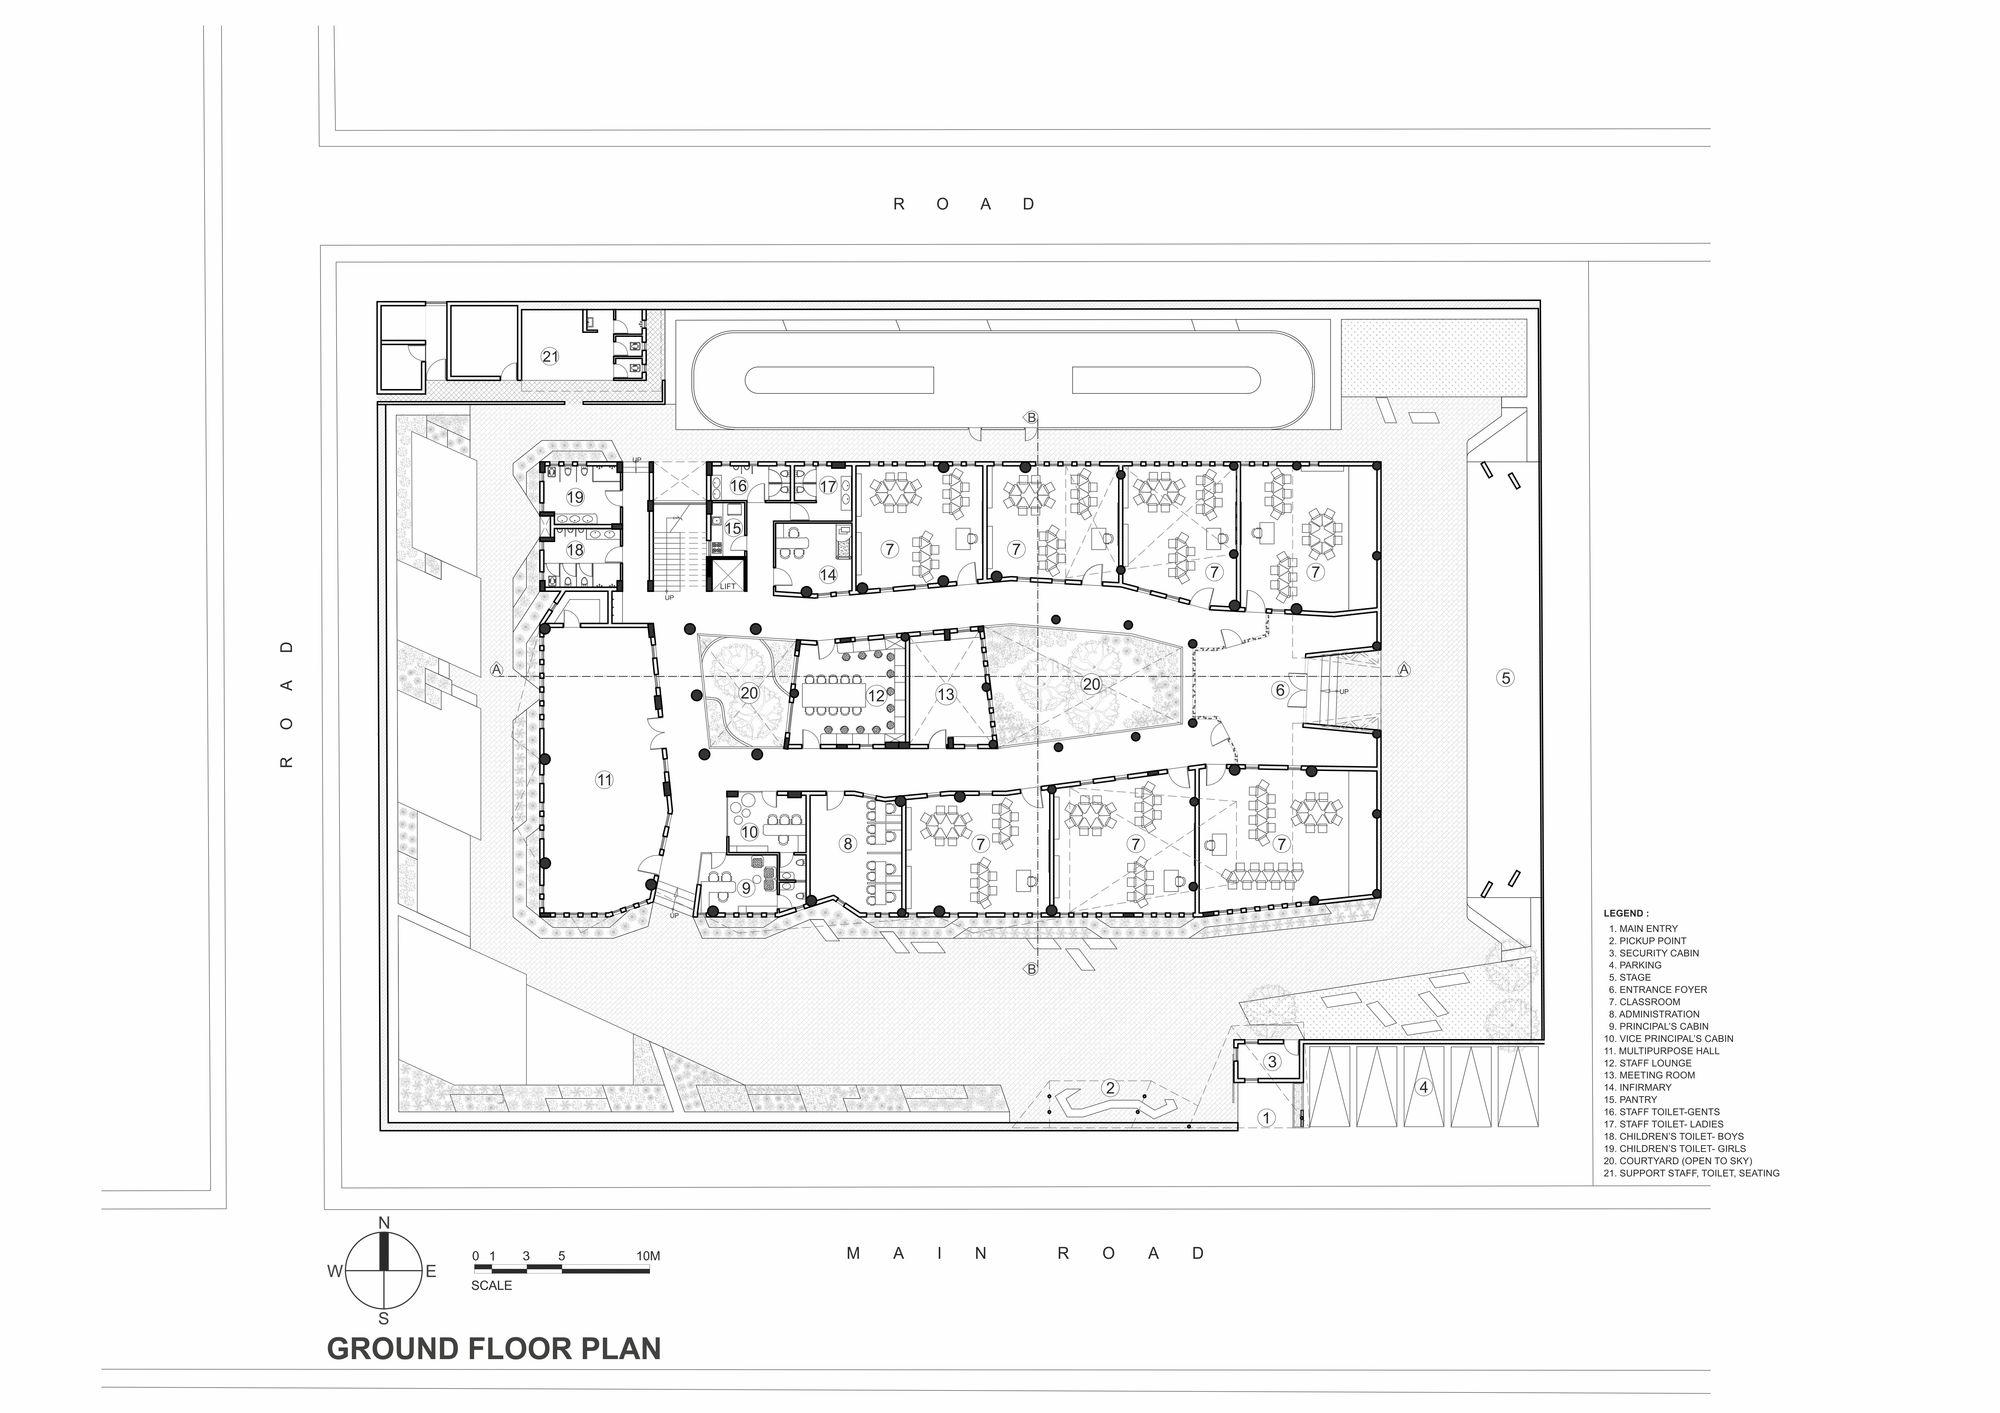 m1 _SANGAM_ELEMENTARY_SCHOOL_GROUND_FLOOR_PLAN.jpg